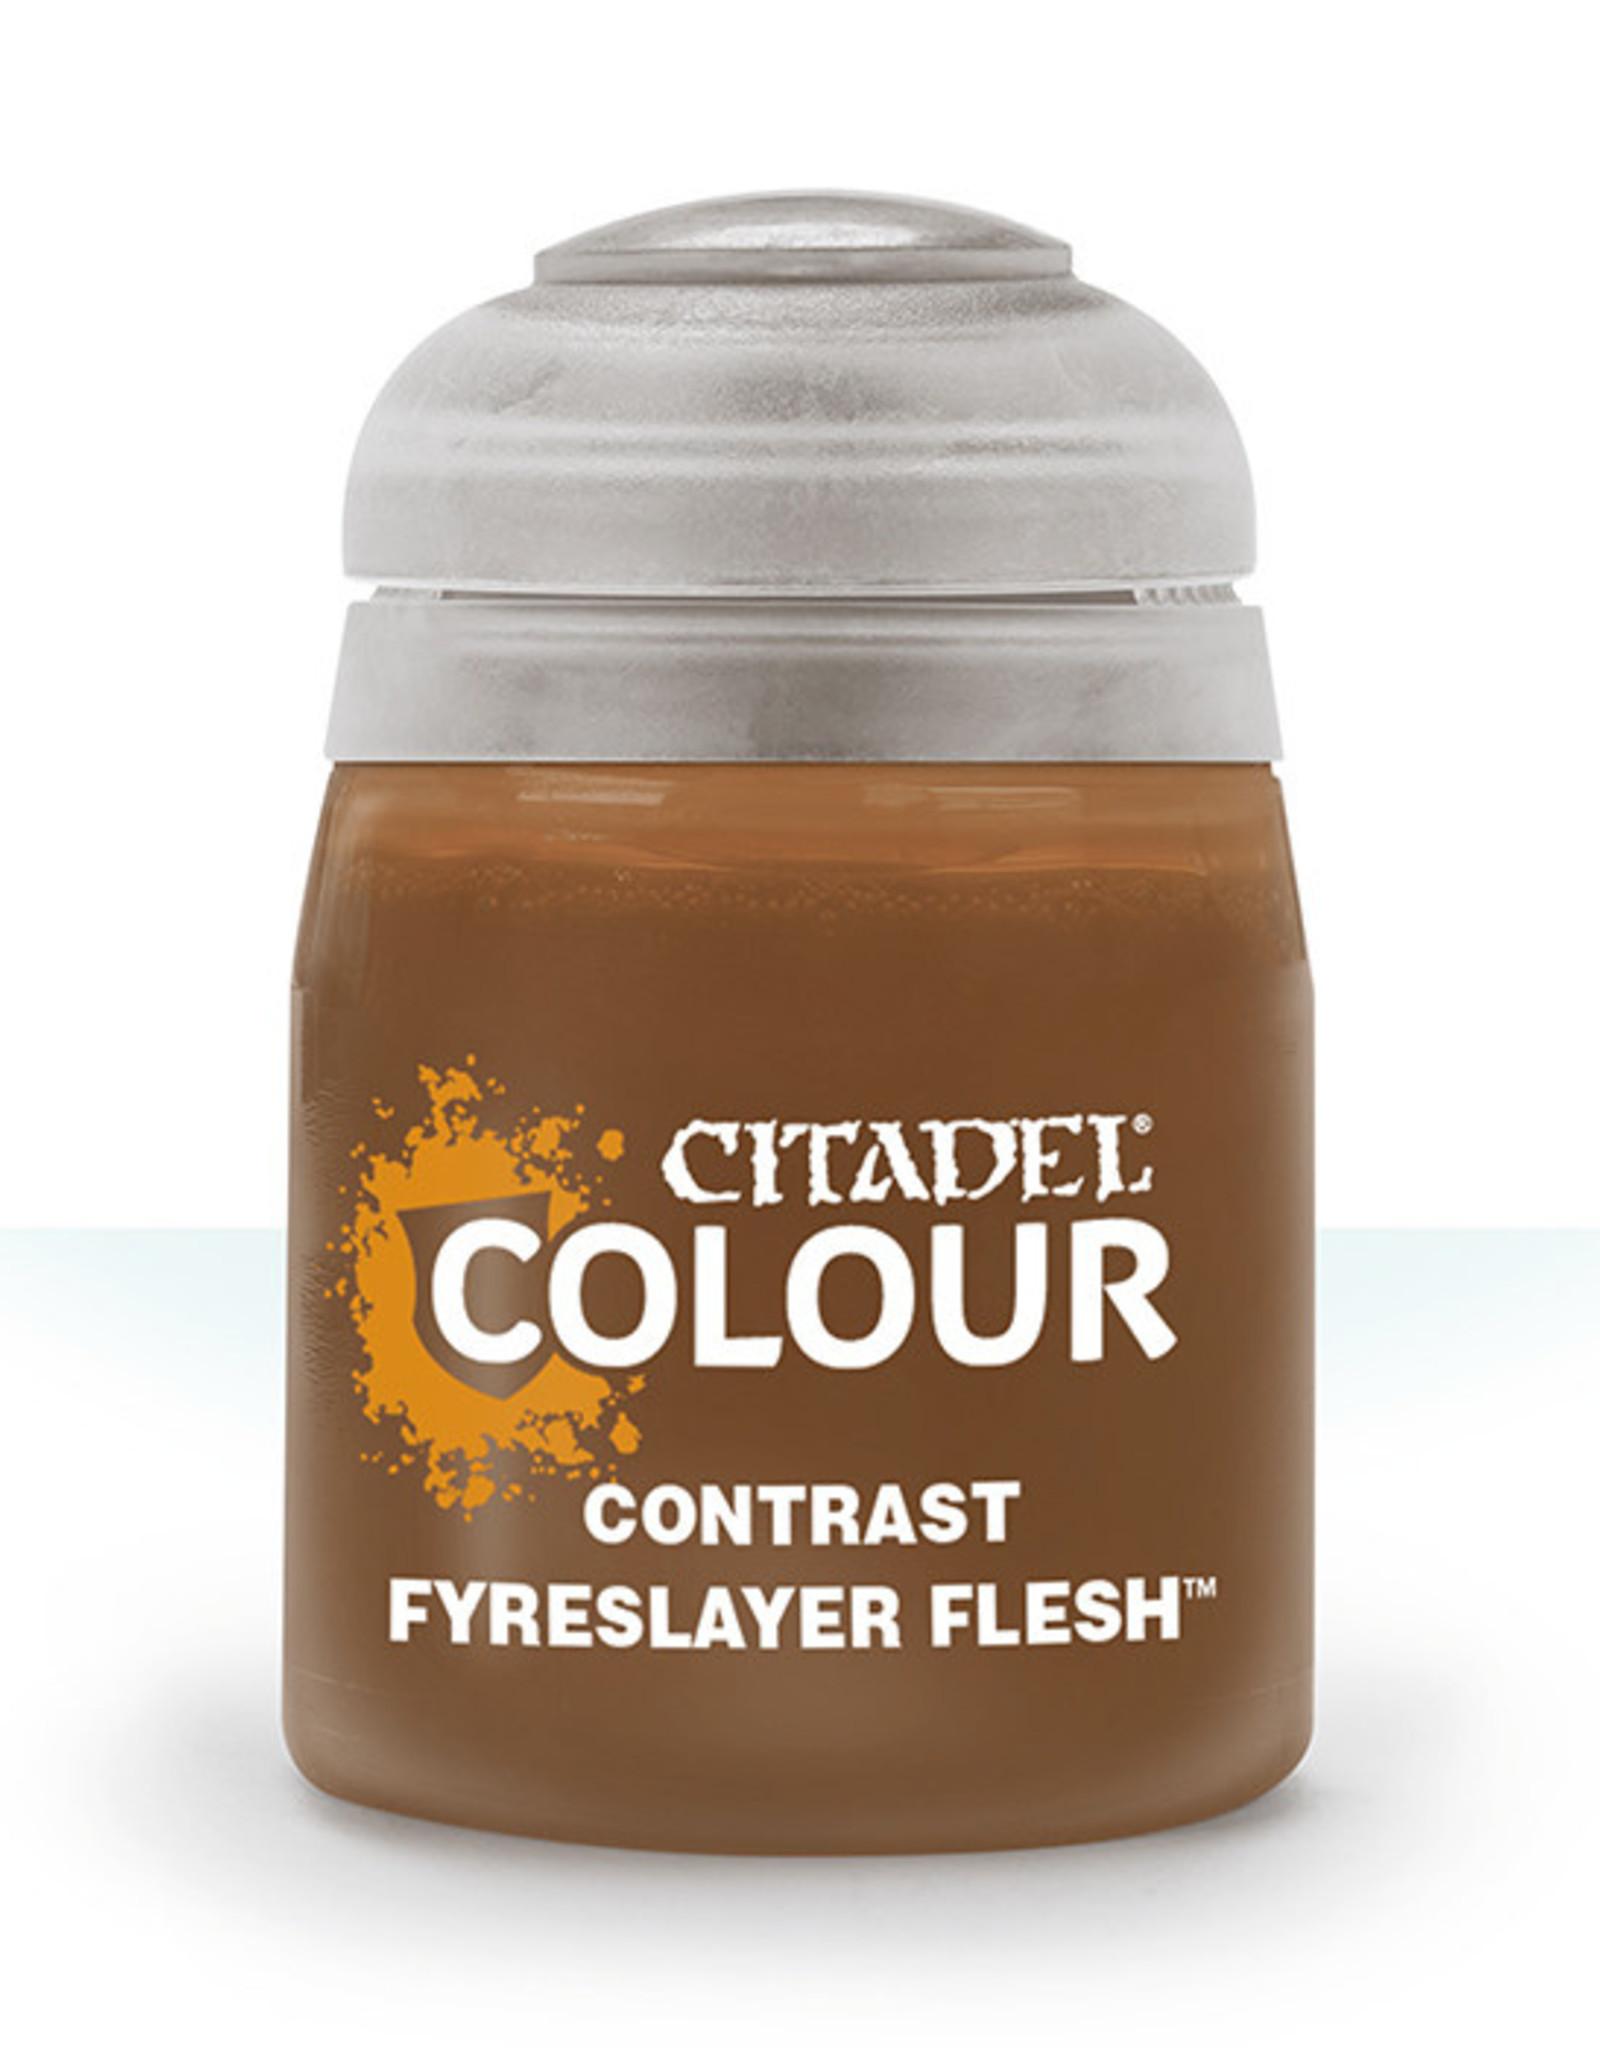 Citadel Citadel Colour: Contrast - Fyreslayer Flesh